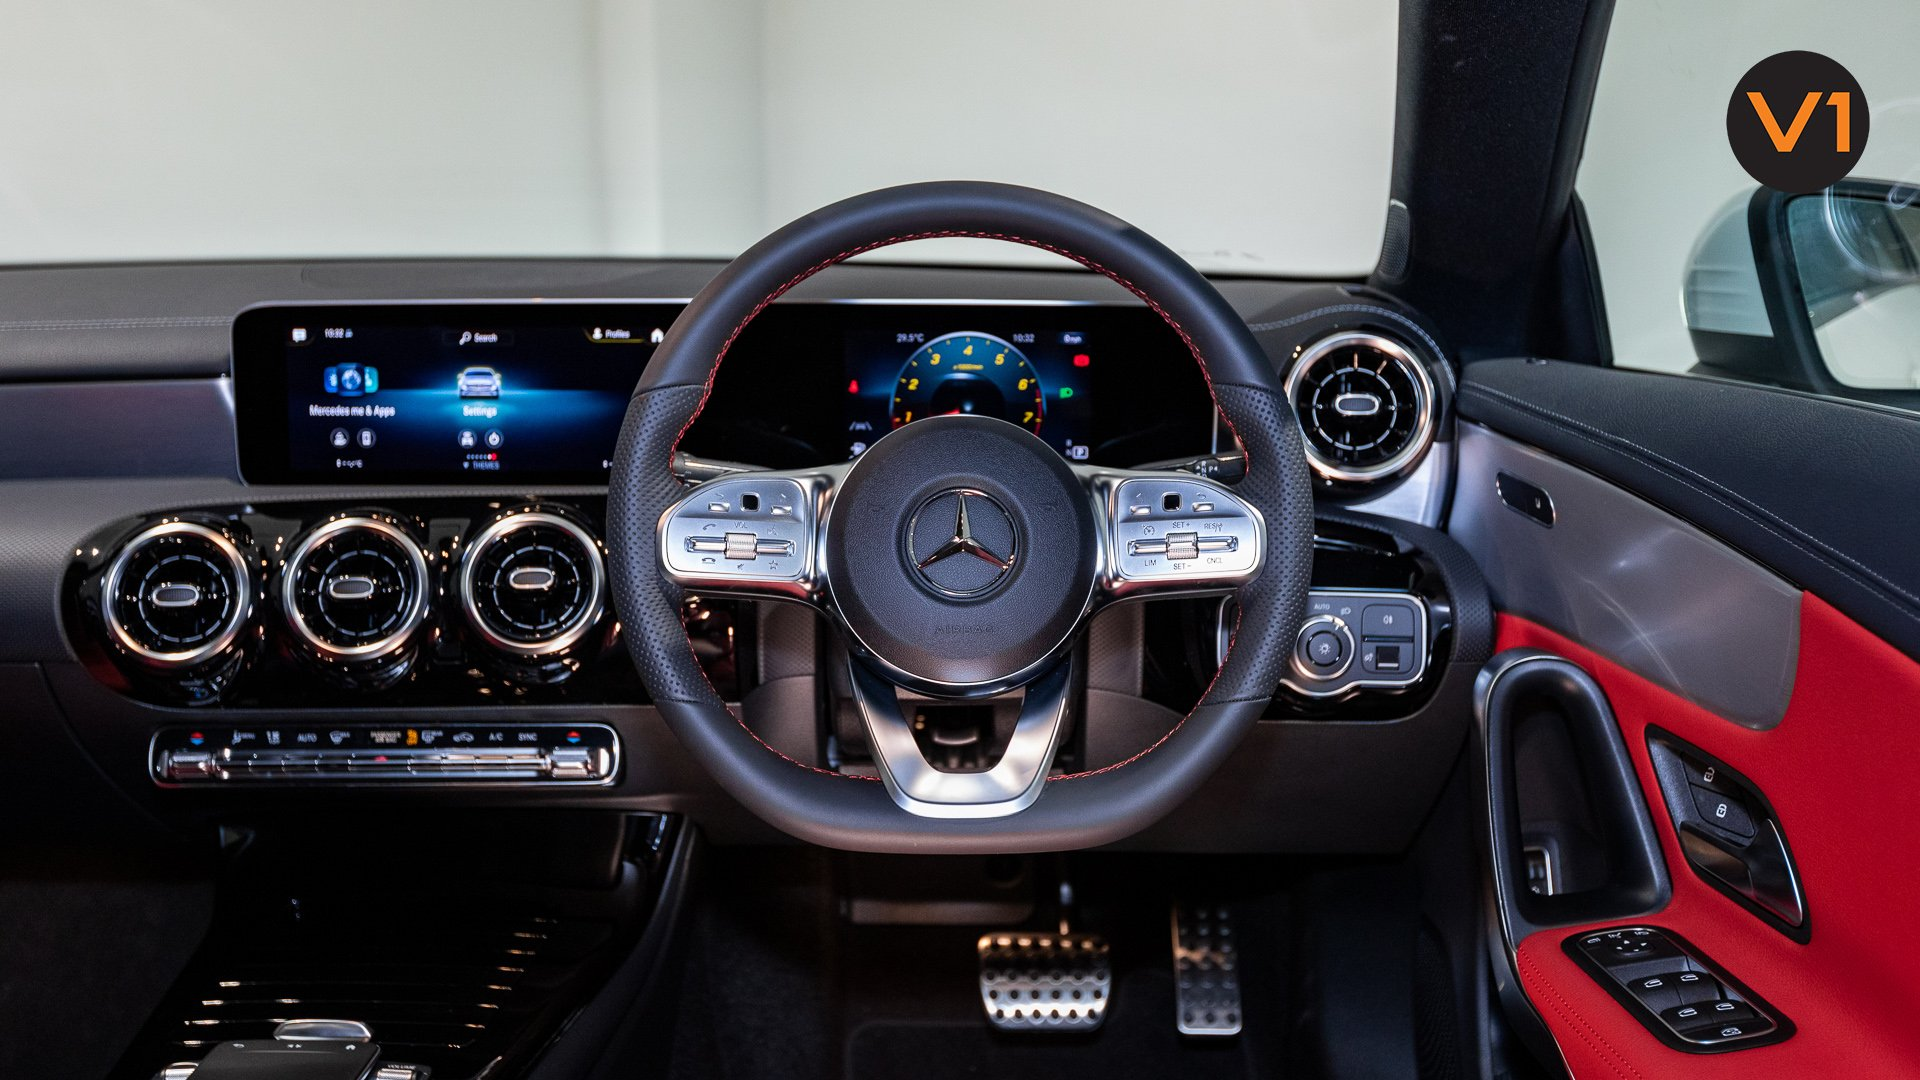 Mercedes-Benz CLA180 Coupe AMG - Digital Instrument Cluster